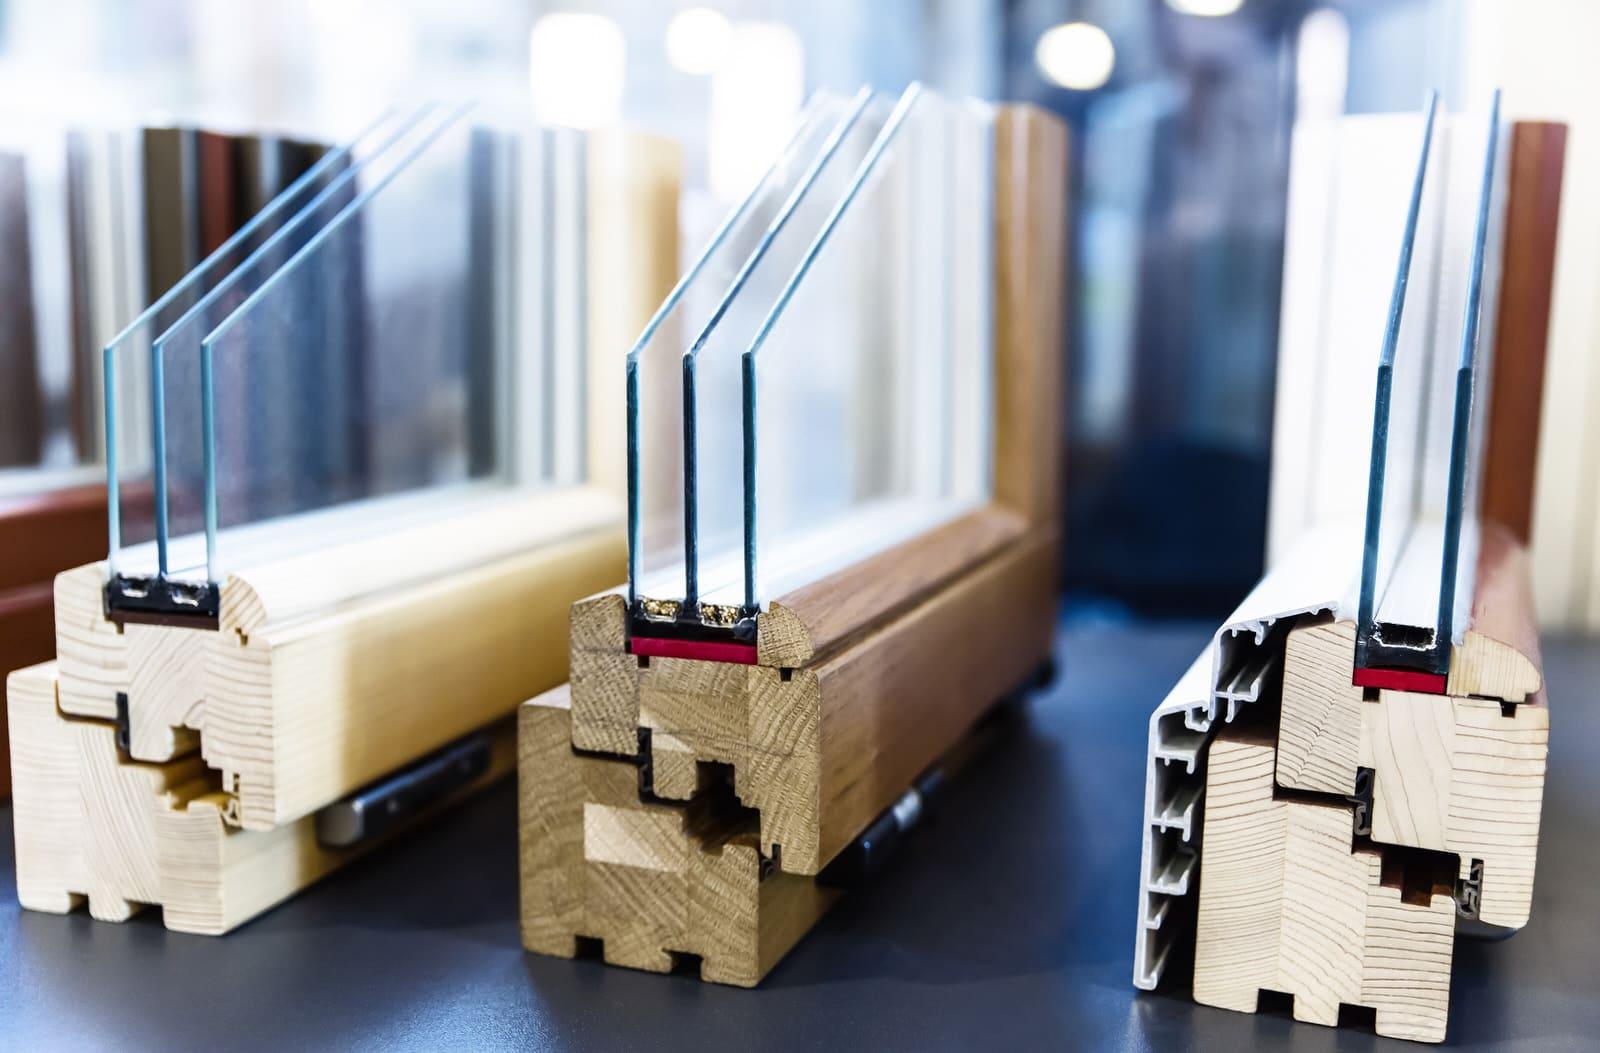 Full Size of Holz Alu Fenster Preis Preise Pro M2 Aluminium Kosten Unilux Holz Alu Erfahrungen Preisliste Preisunterschied Online Josko Qm Leistung Preisvergleich Diese Fenster Holz Alu Fenster Preise